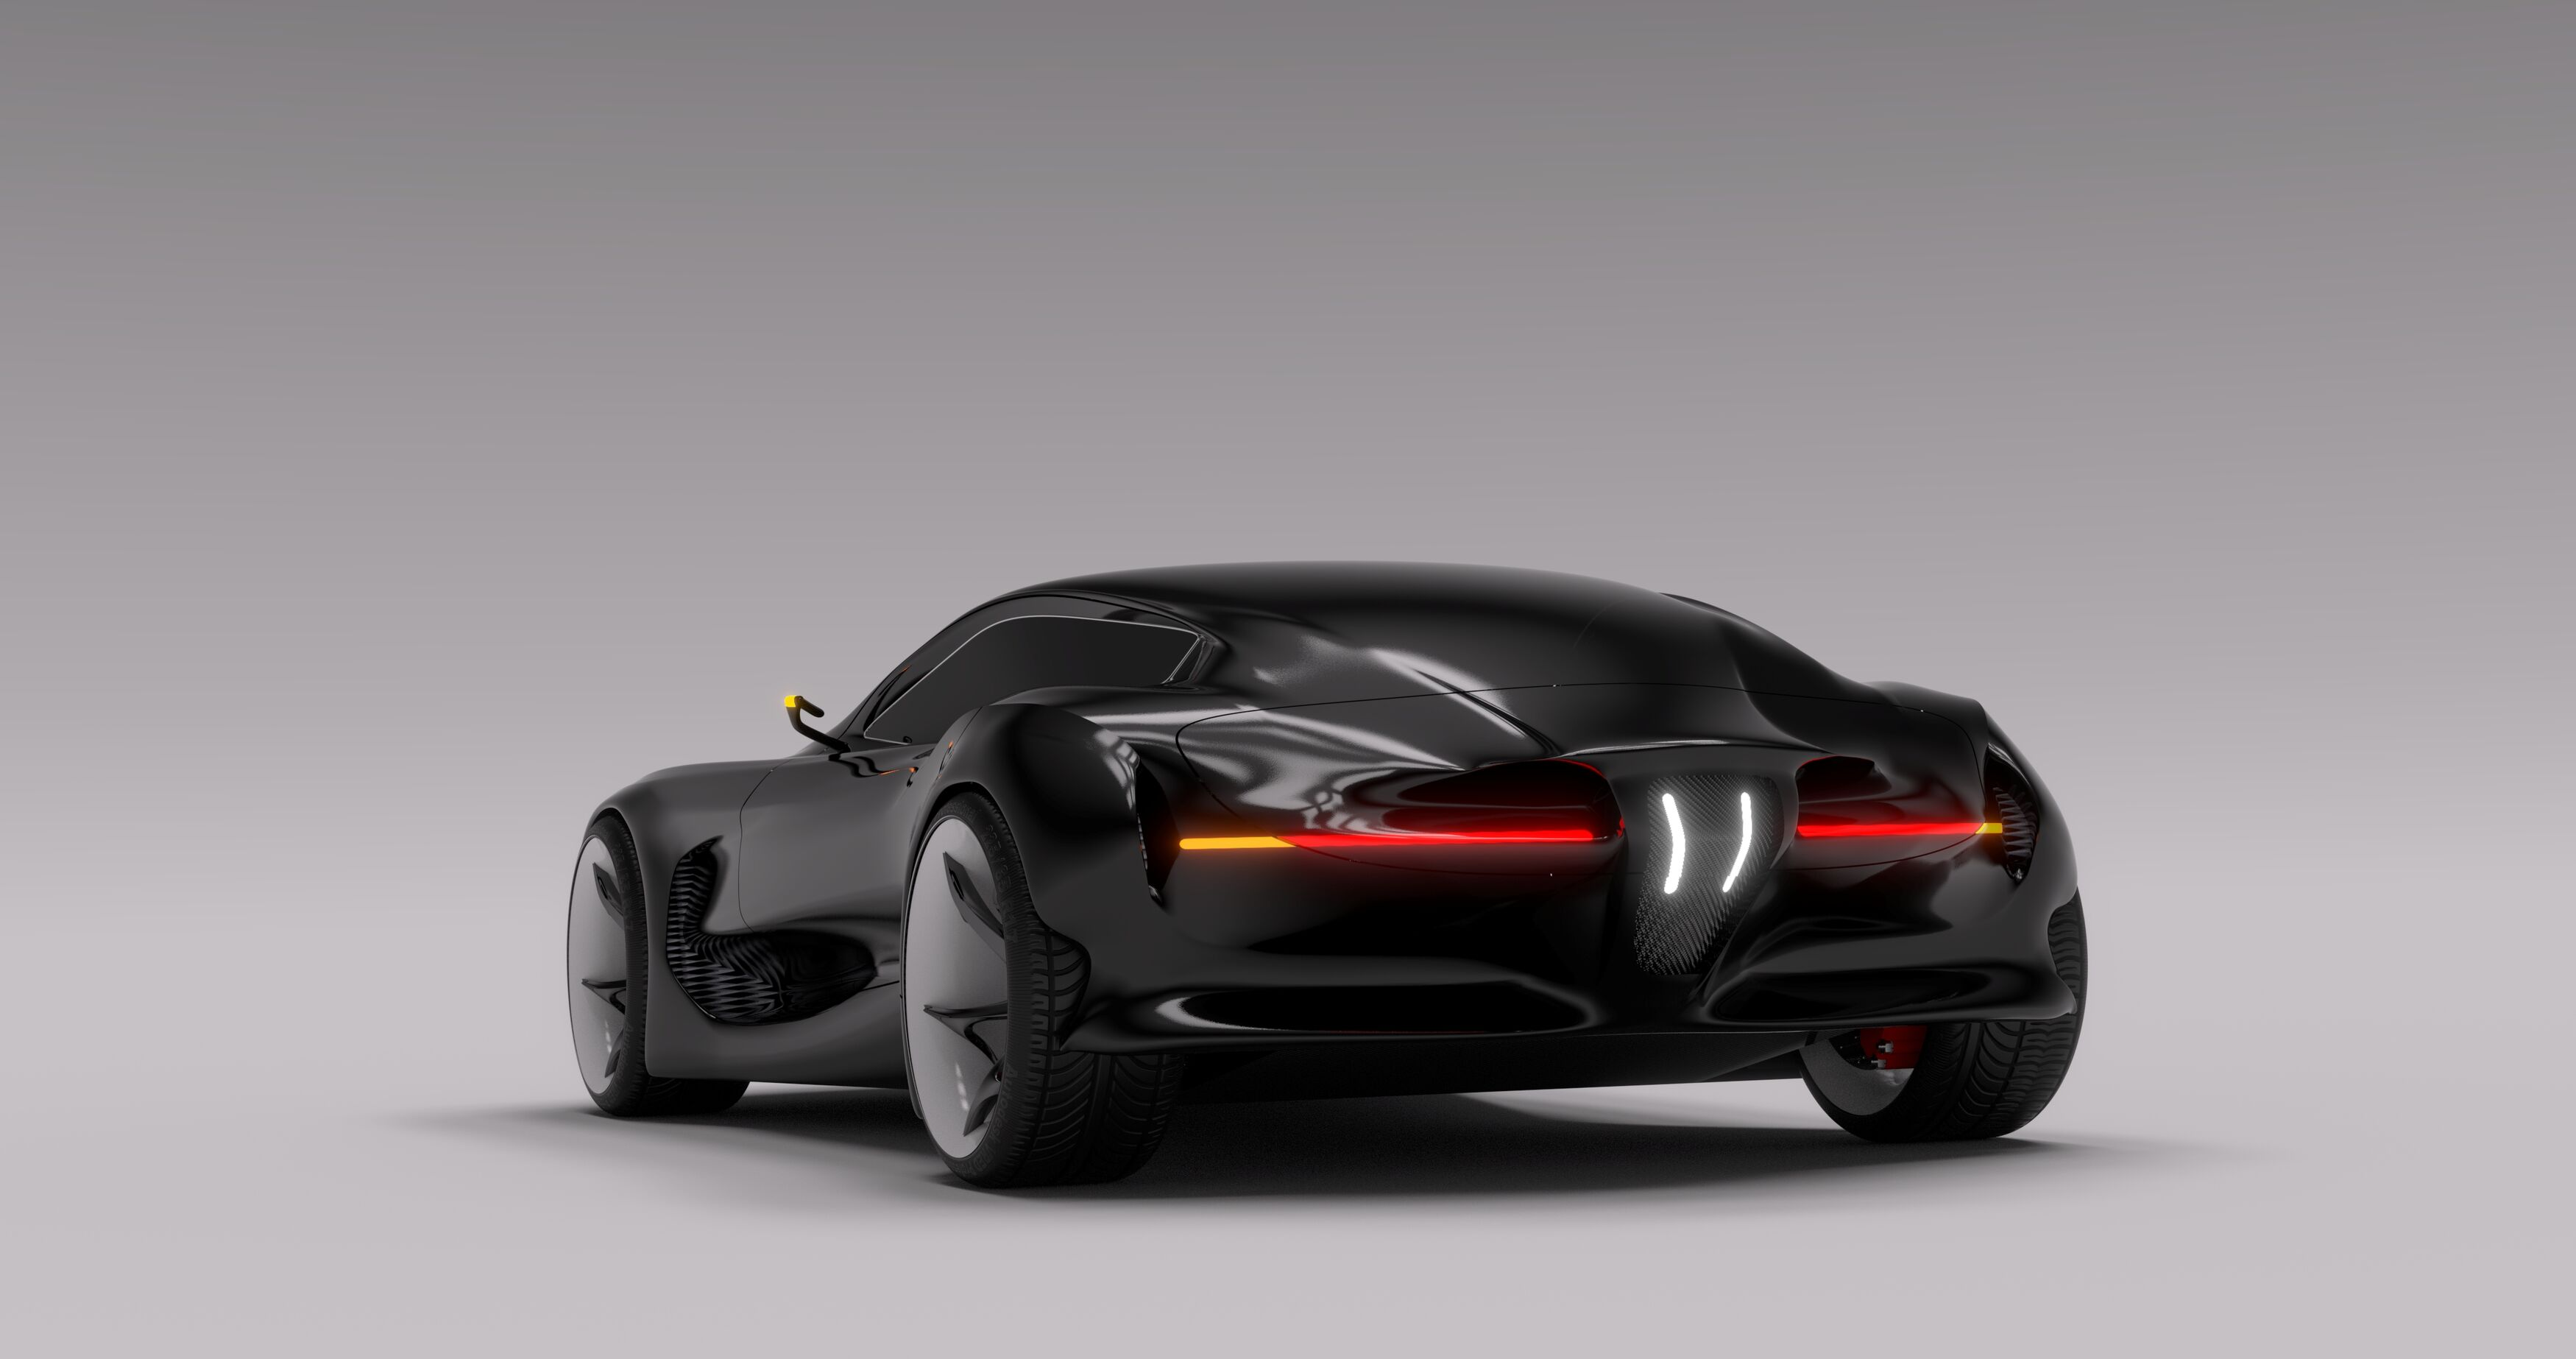 Aston-martin-db-zagato-x-9-3500-3500